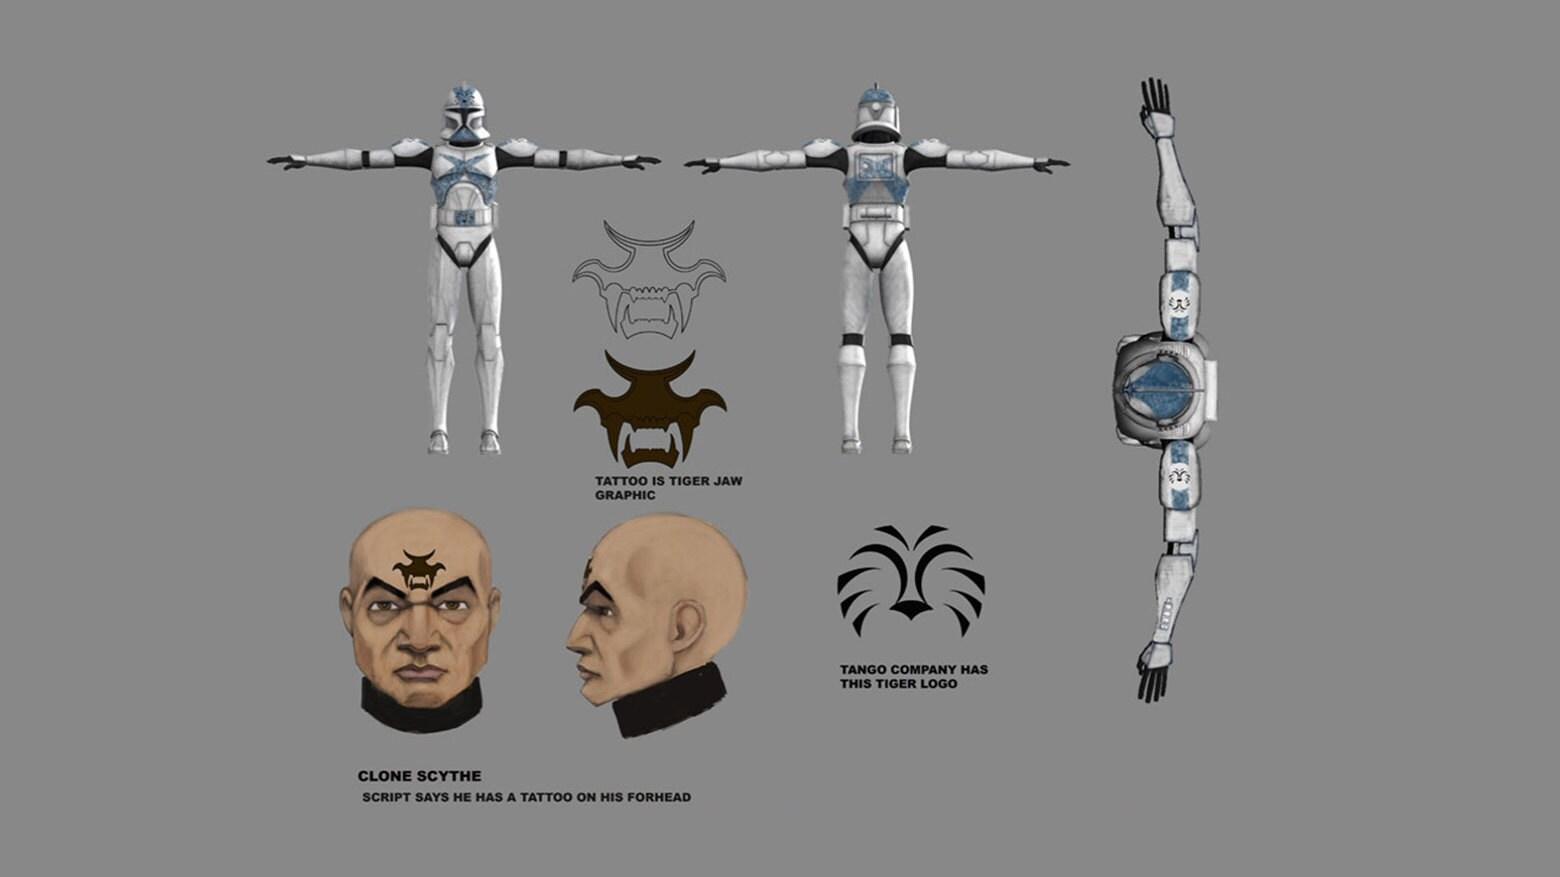 star wars clonetrooper concept - photo #19